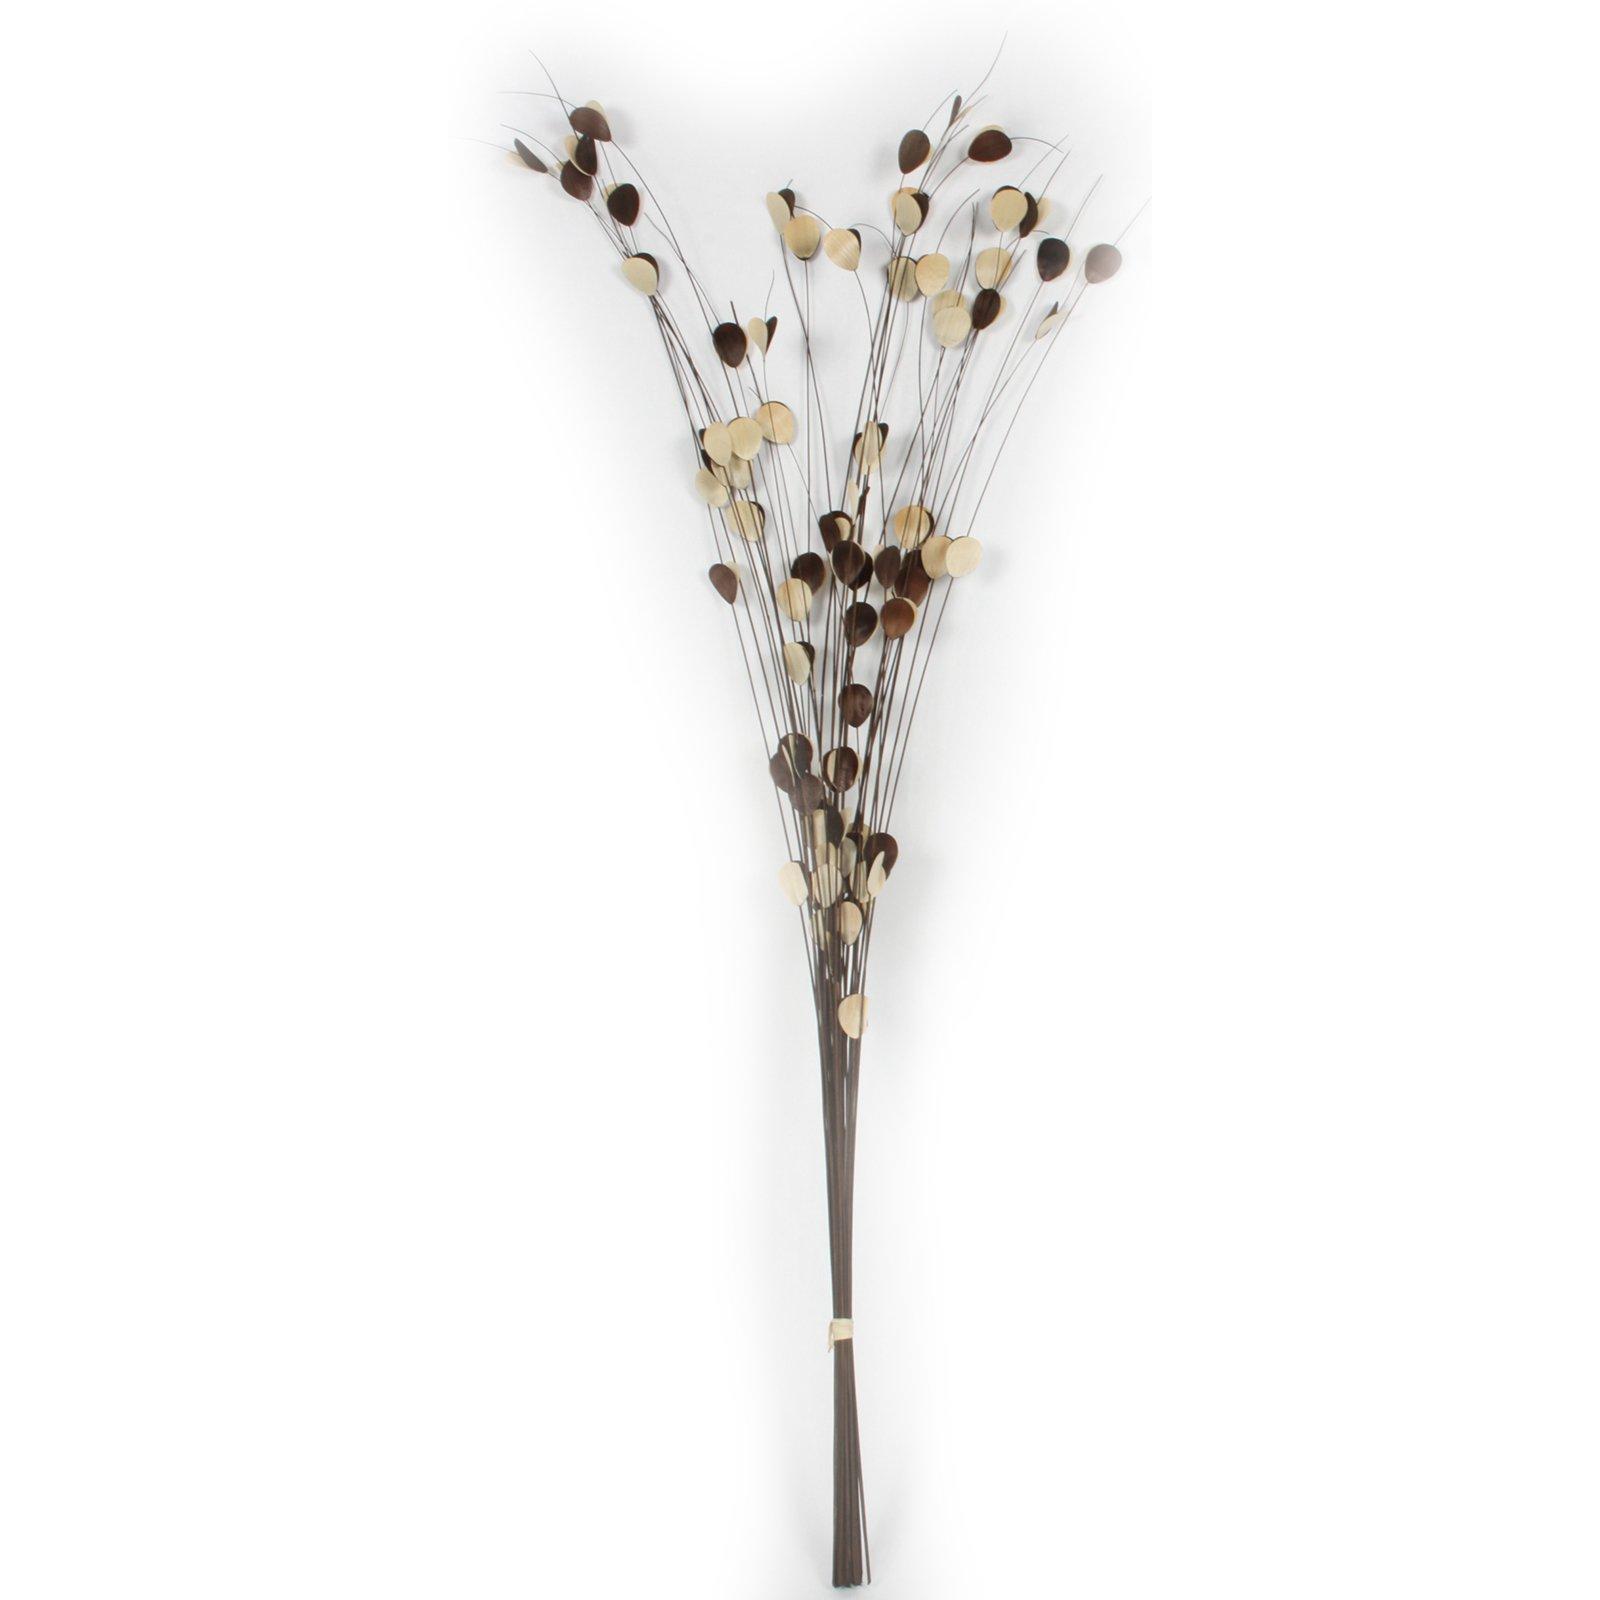 Kunstpflanze Kokuszweig - braun - 100 cm